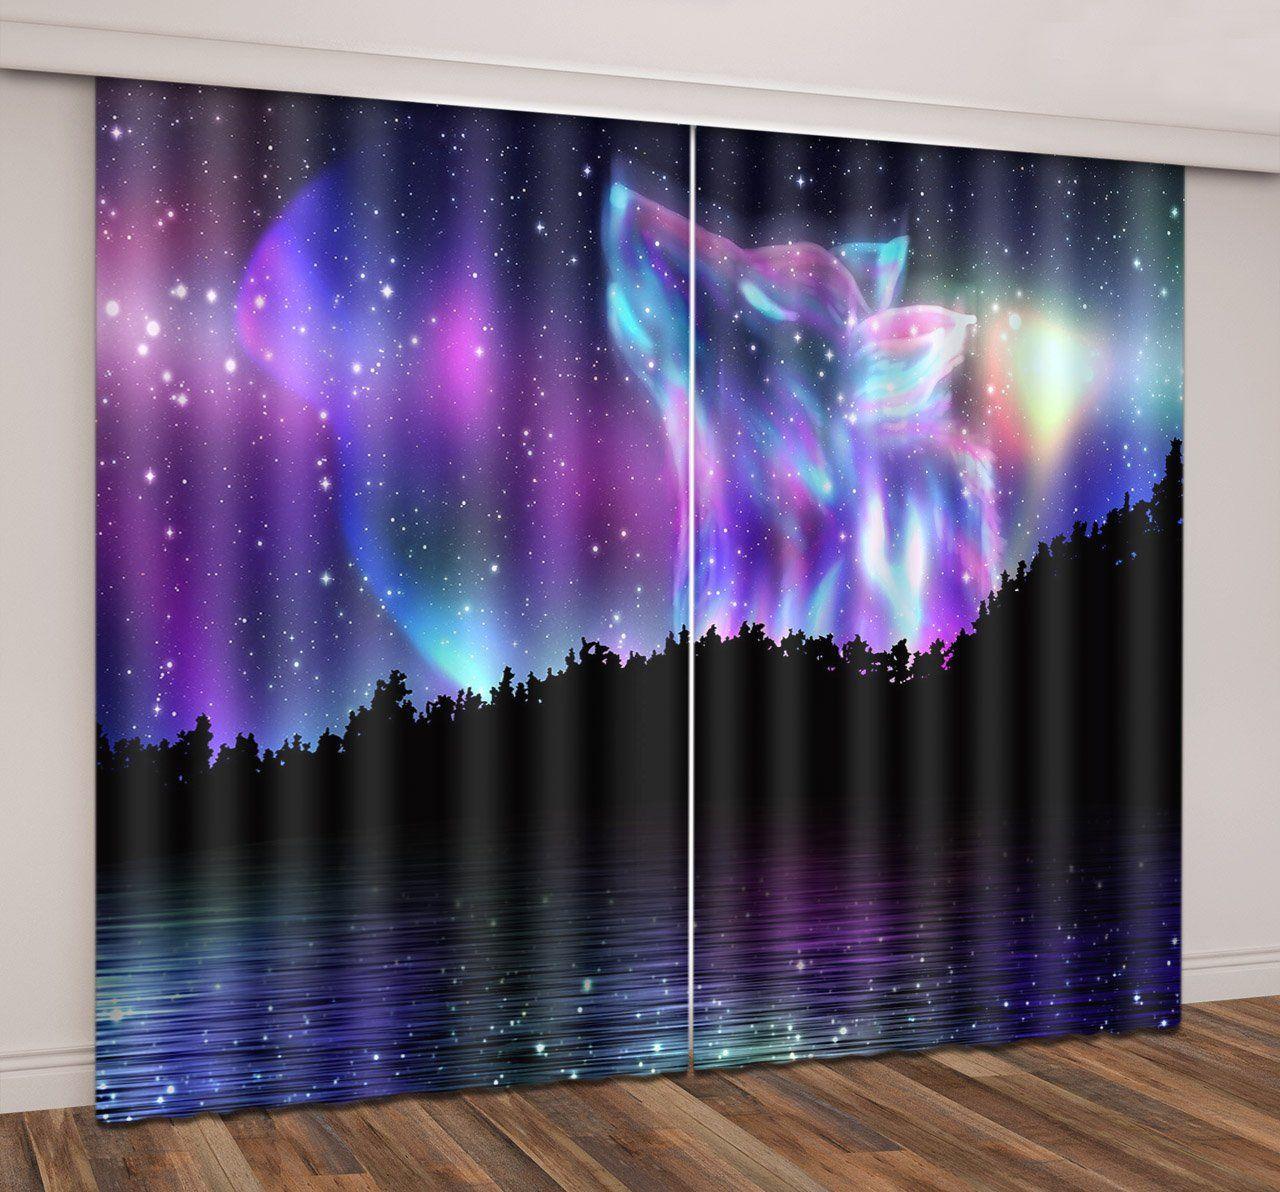 2Panel Set Blackout Starry Sky Curtain Living Room Bedroom Decor Window Curtains